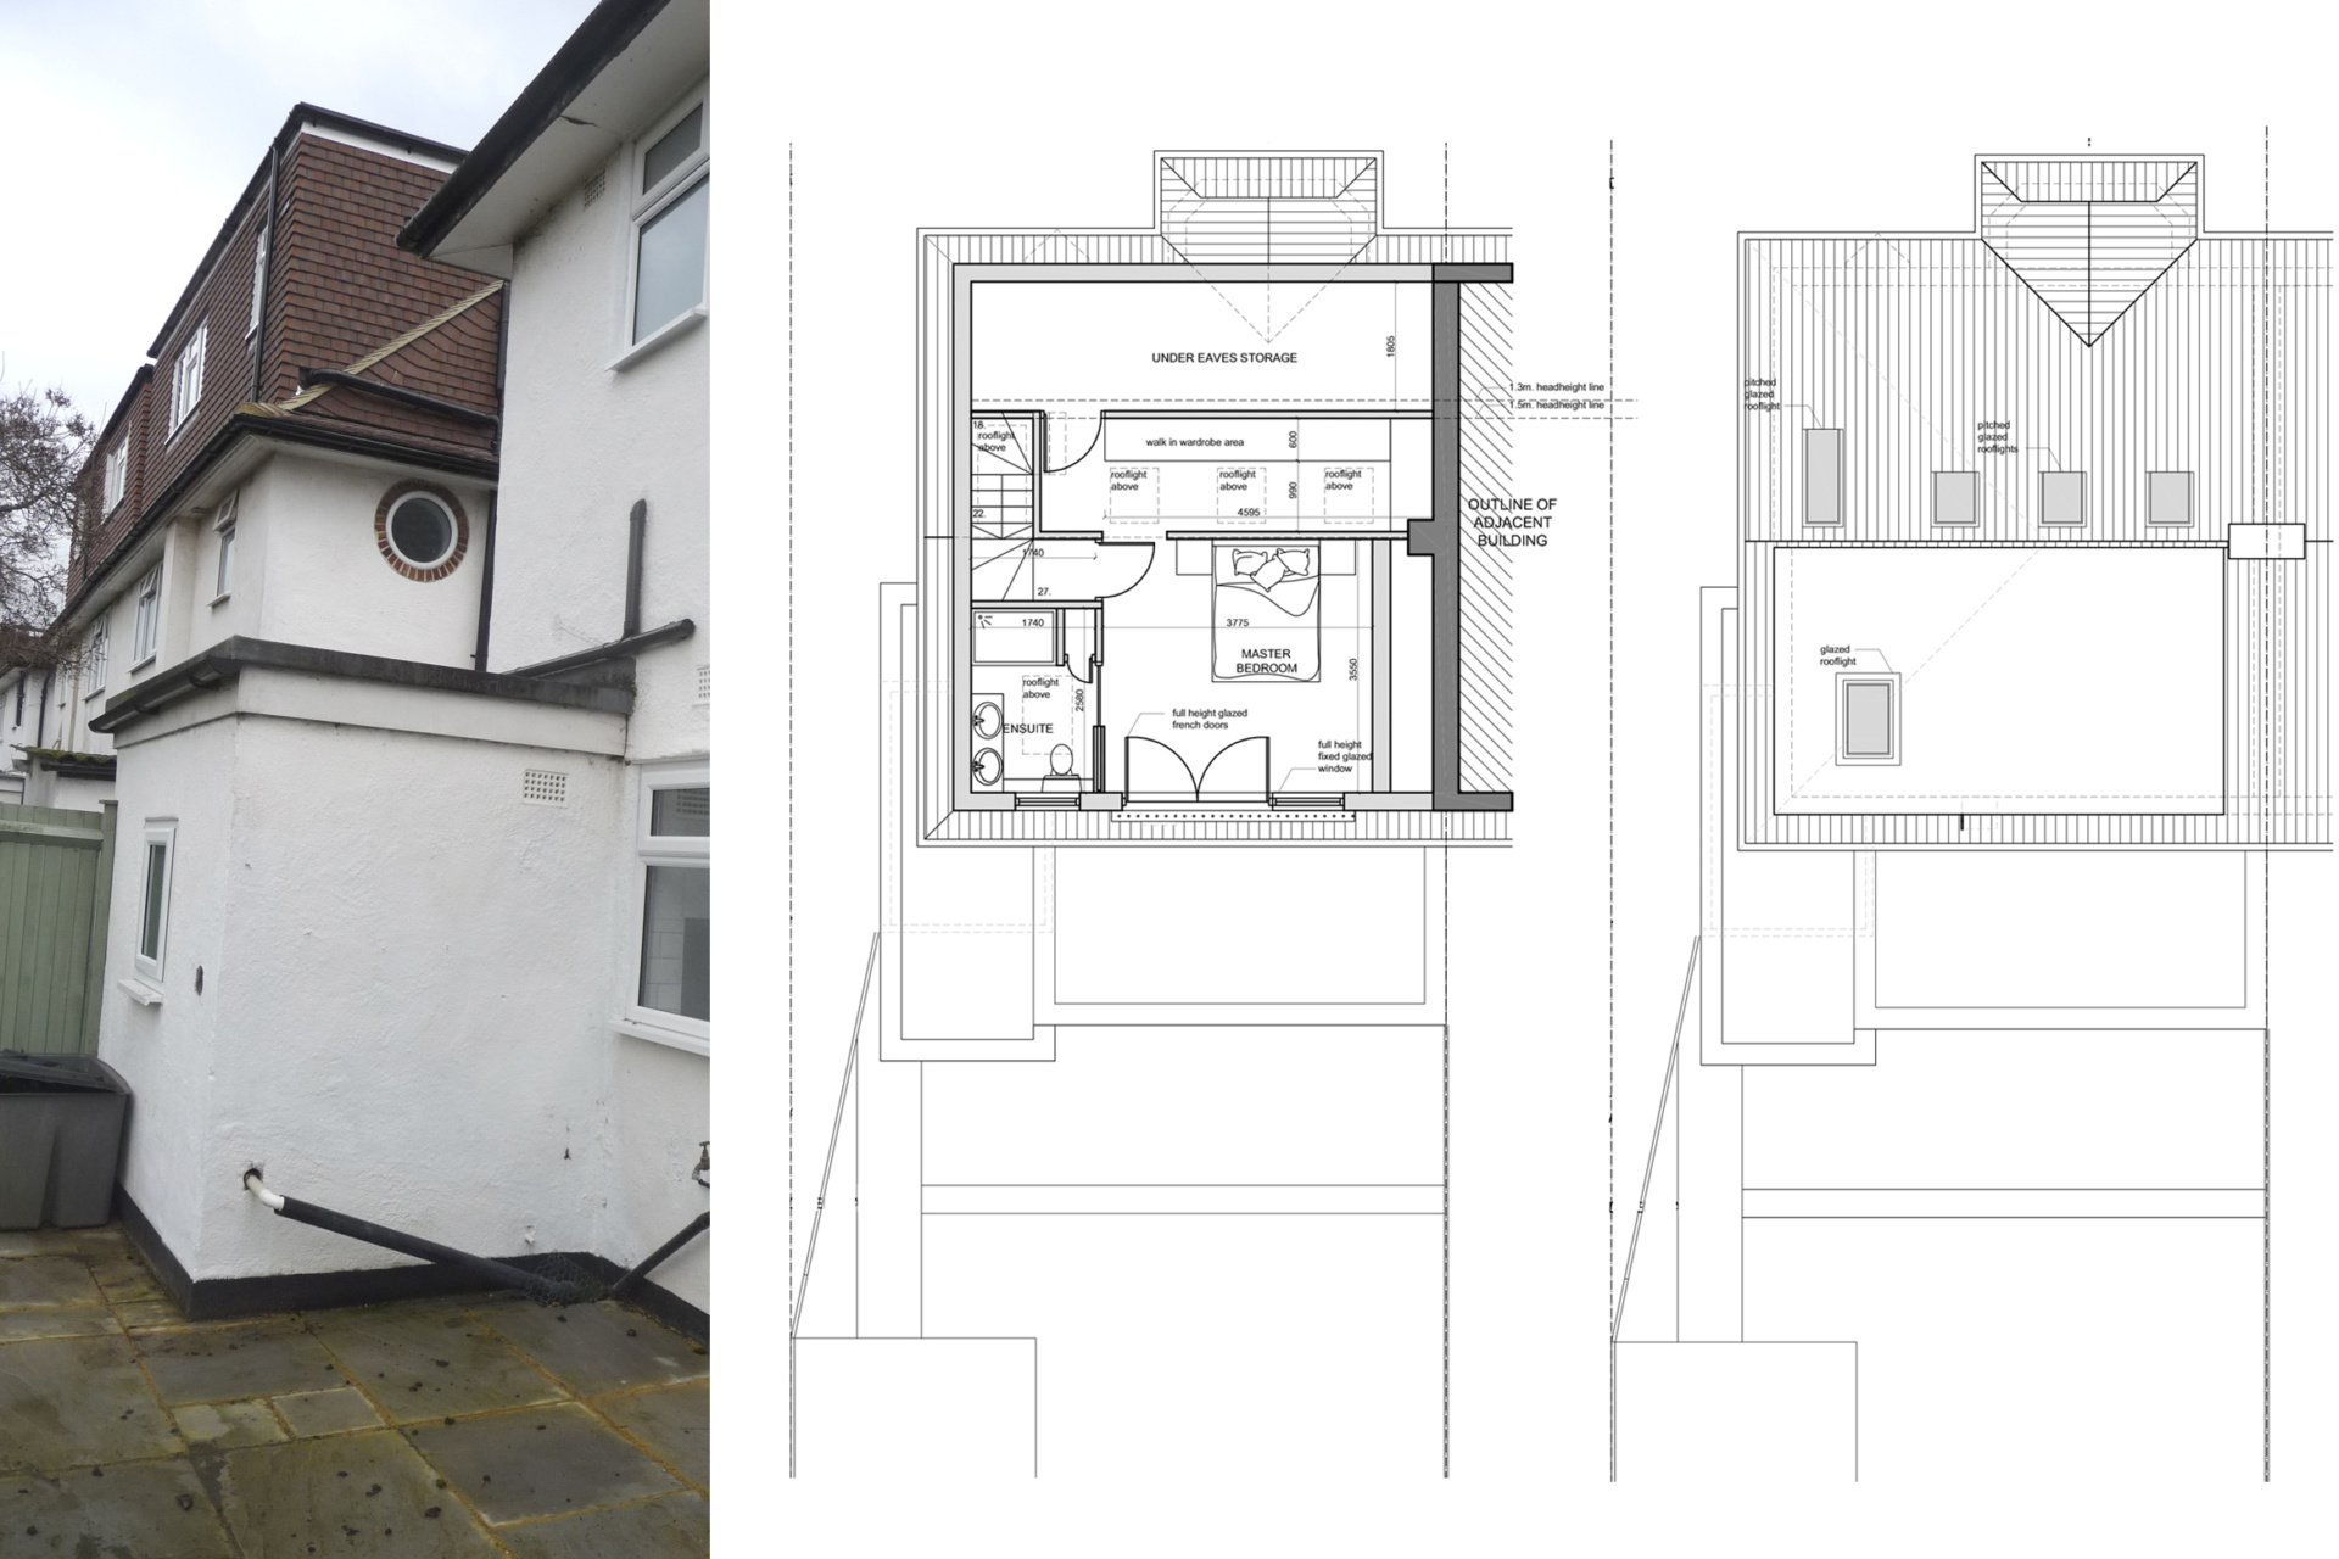 Architect designed roof and kitchen house extension Kingston KT2 Upper floor plans 1 Kingston KT2 | Roof and kitchen house extension